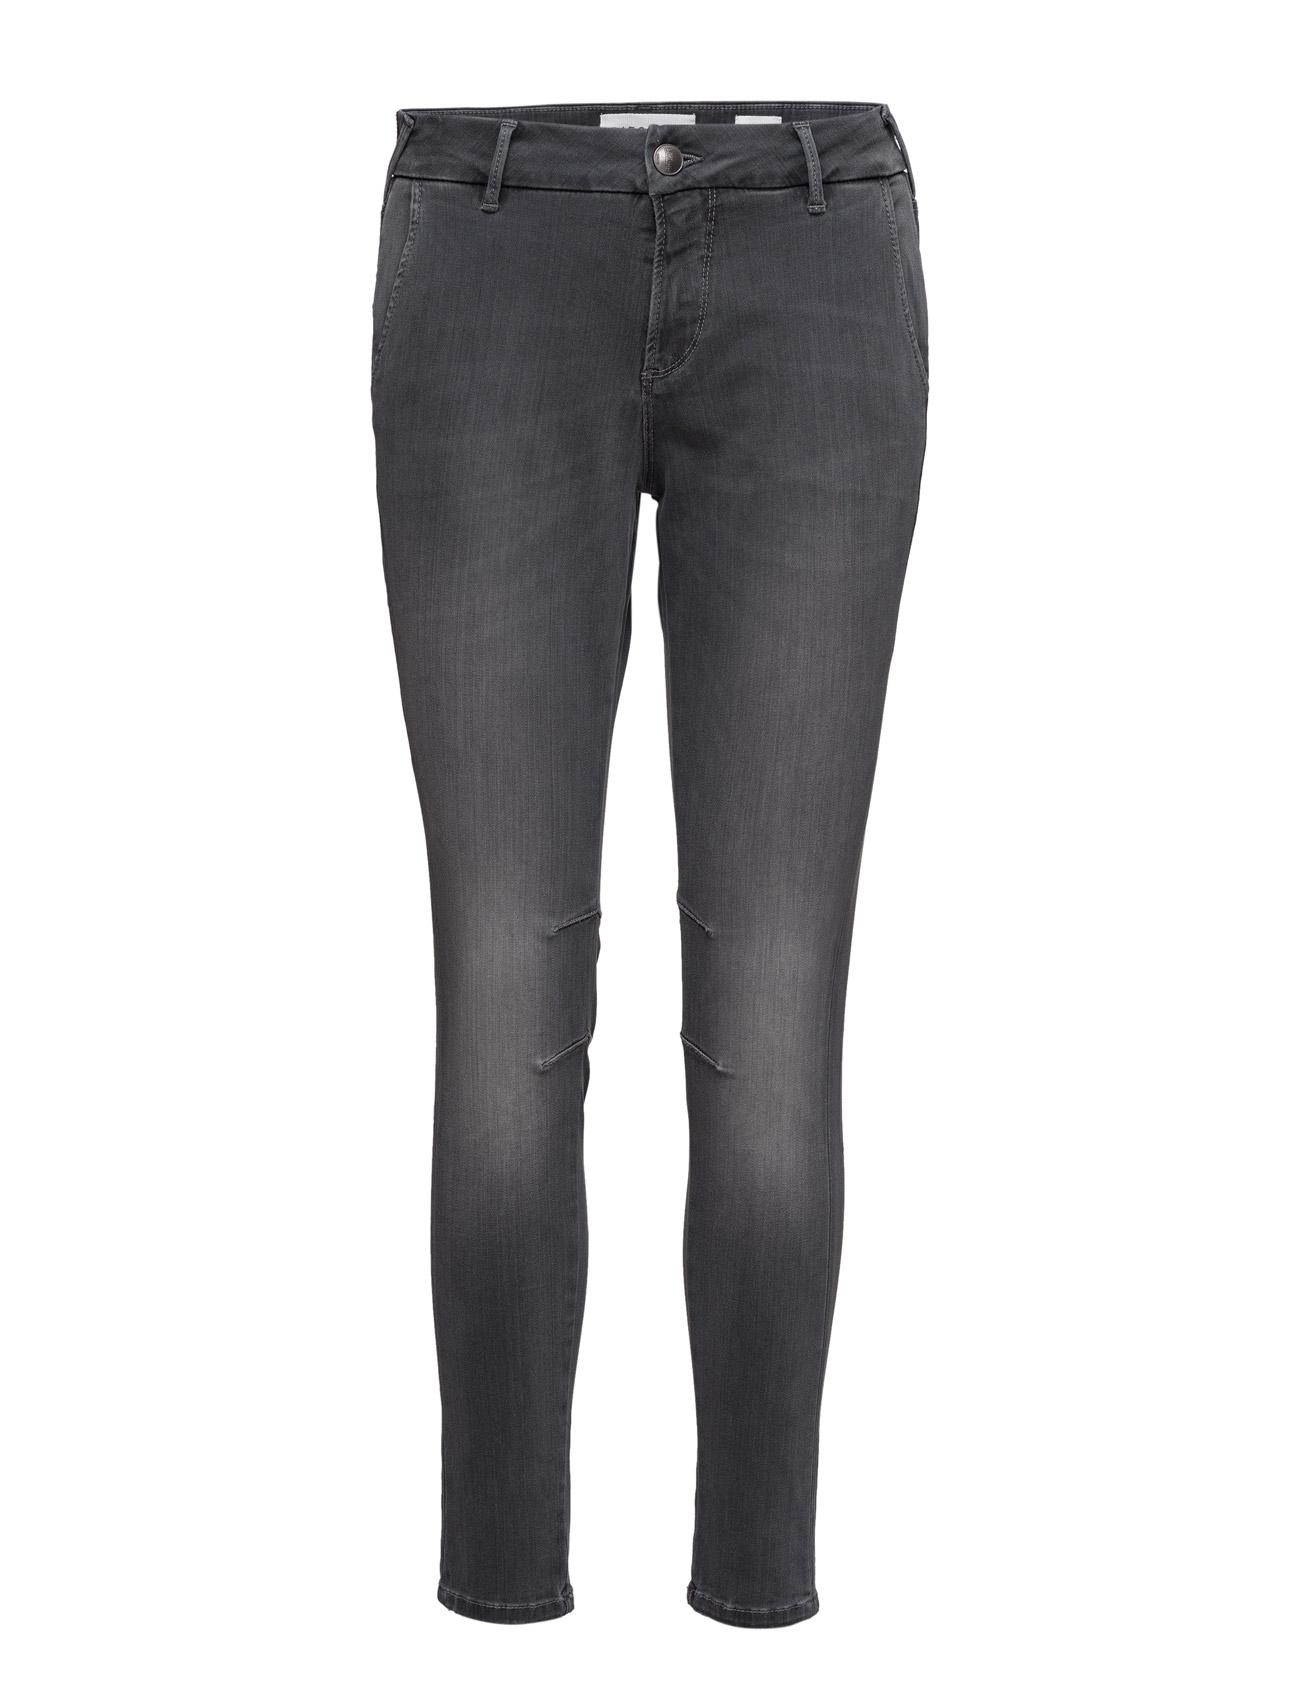 Kenya Jeans Vintage Grey Pieszak Skinny